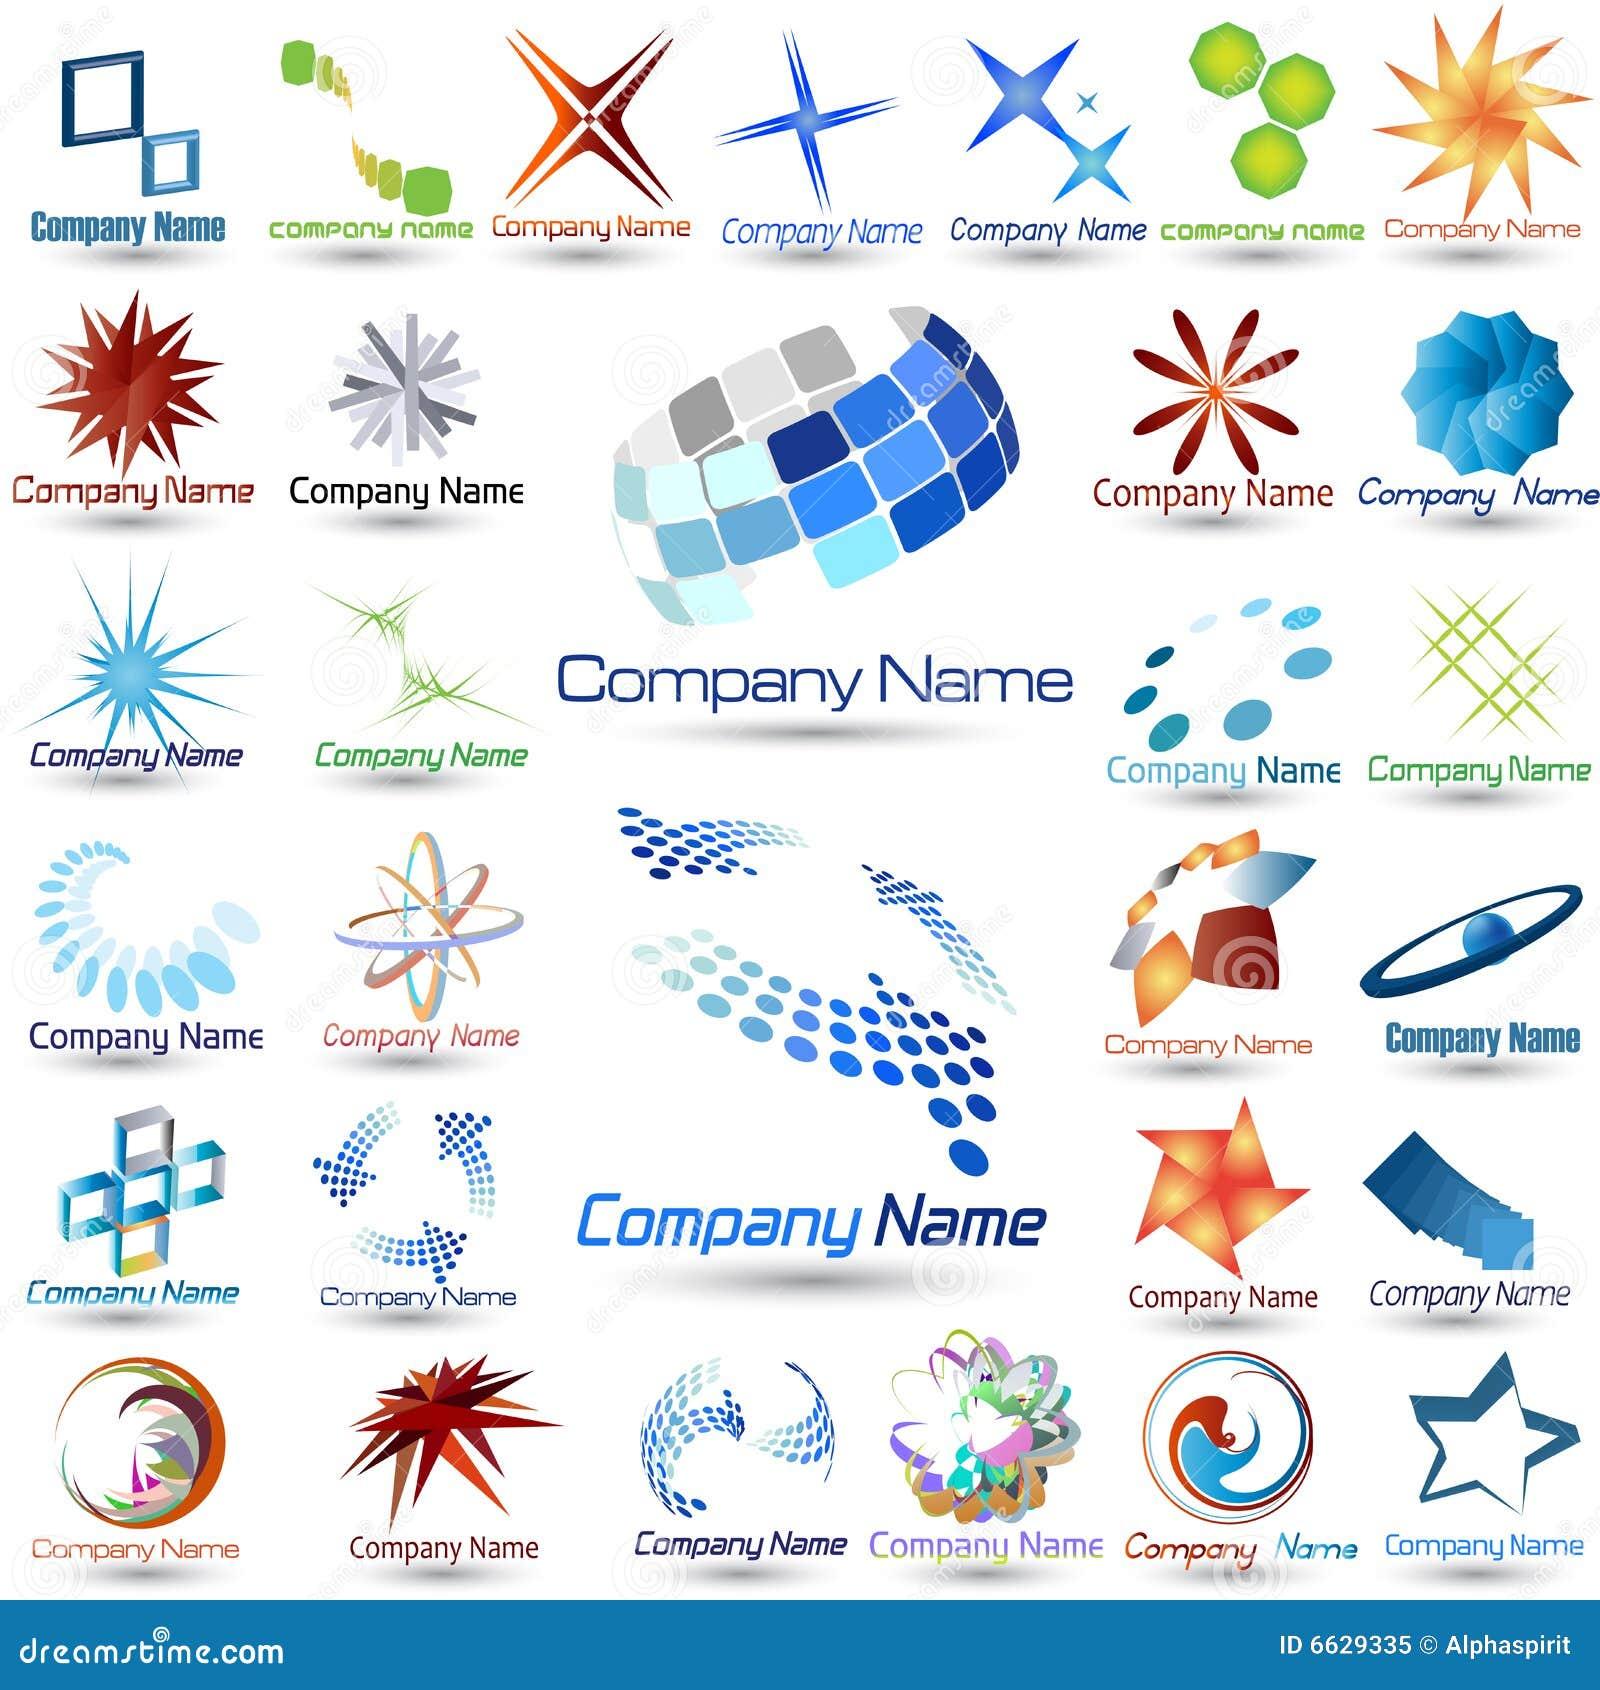 Ramassage de logos